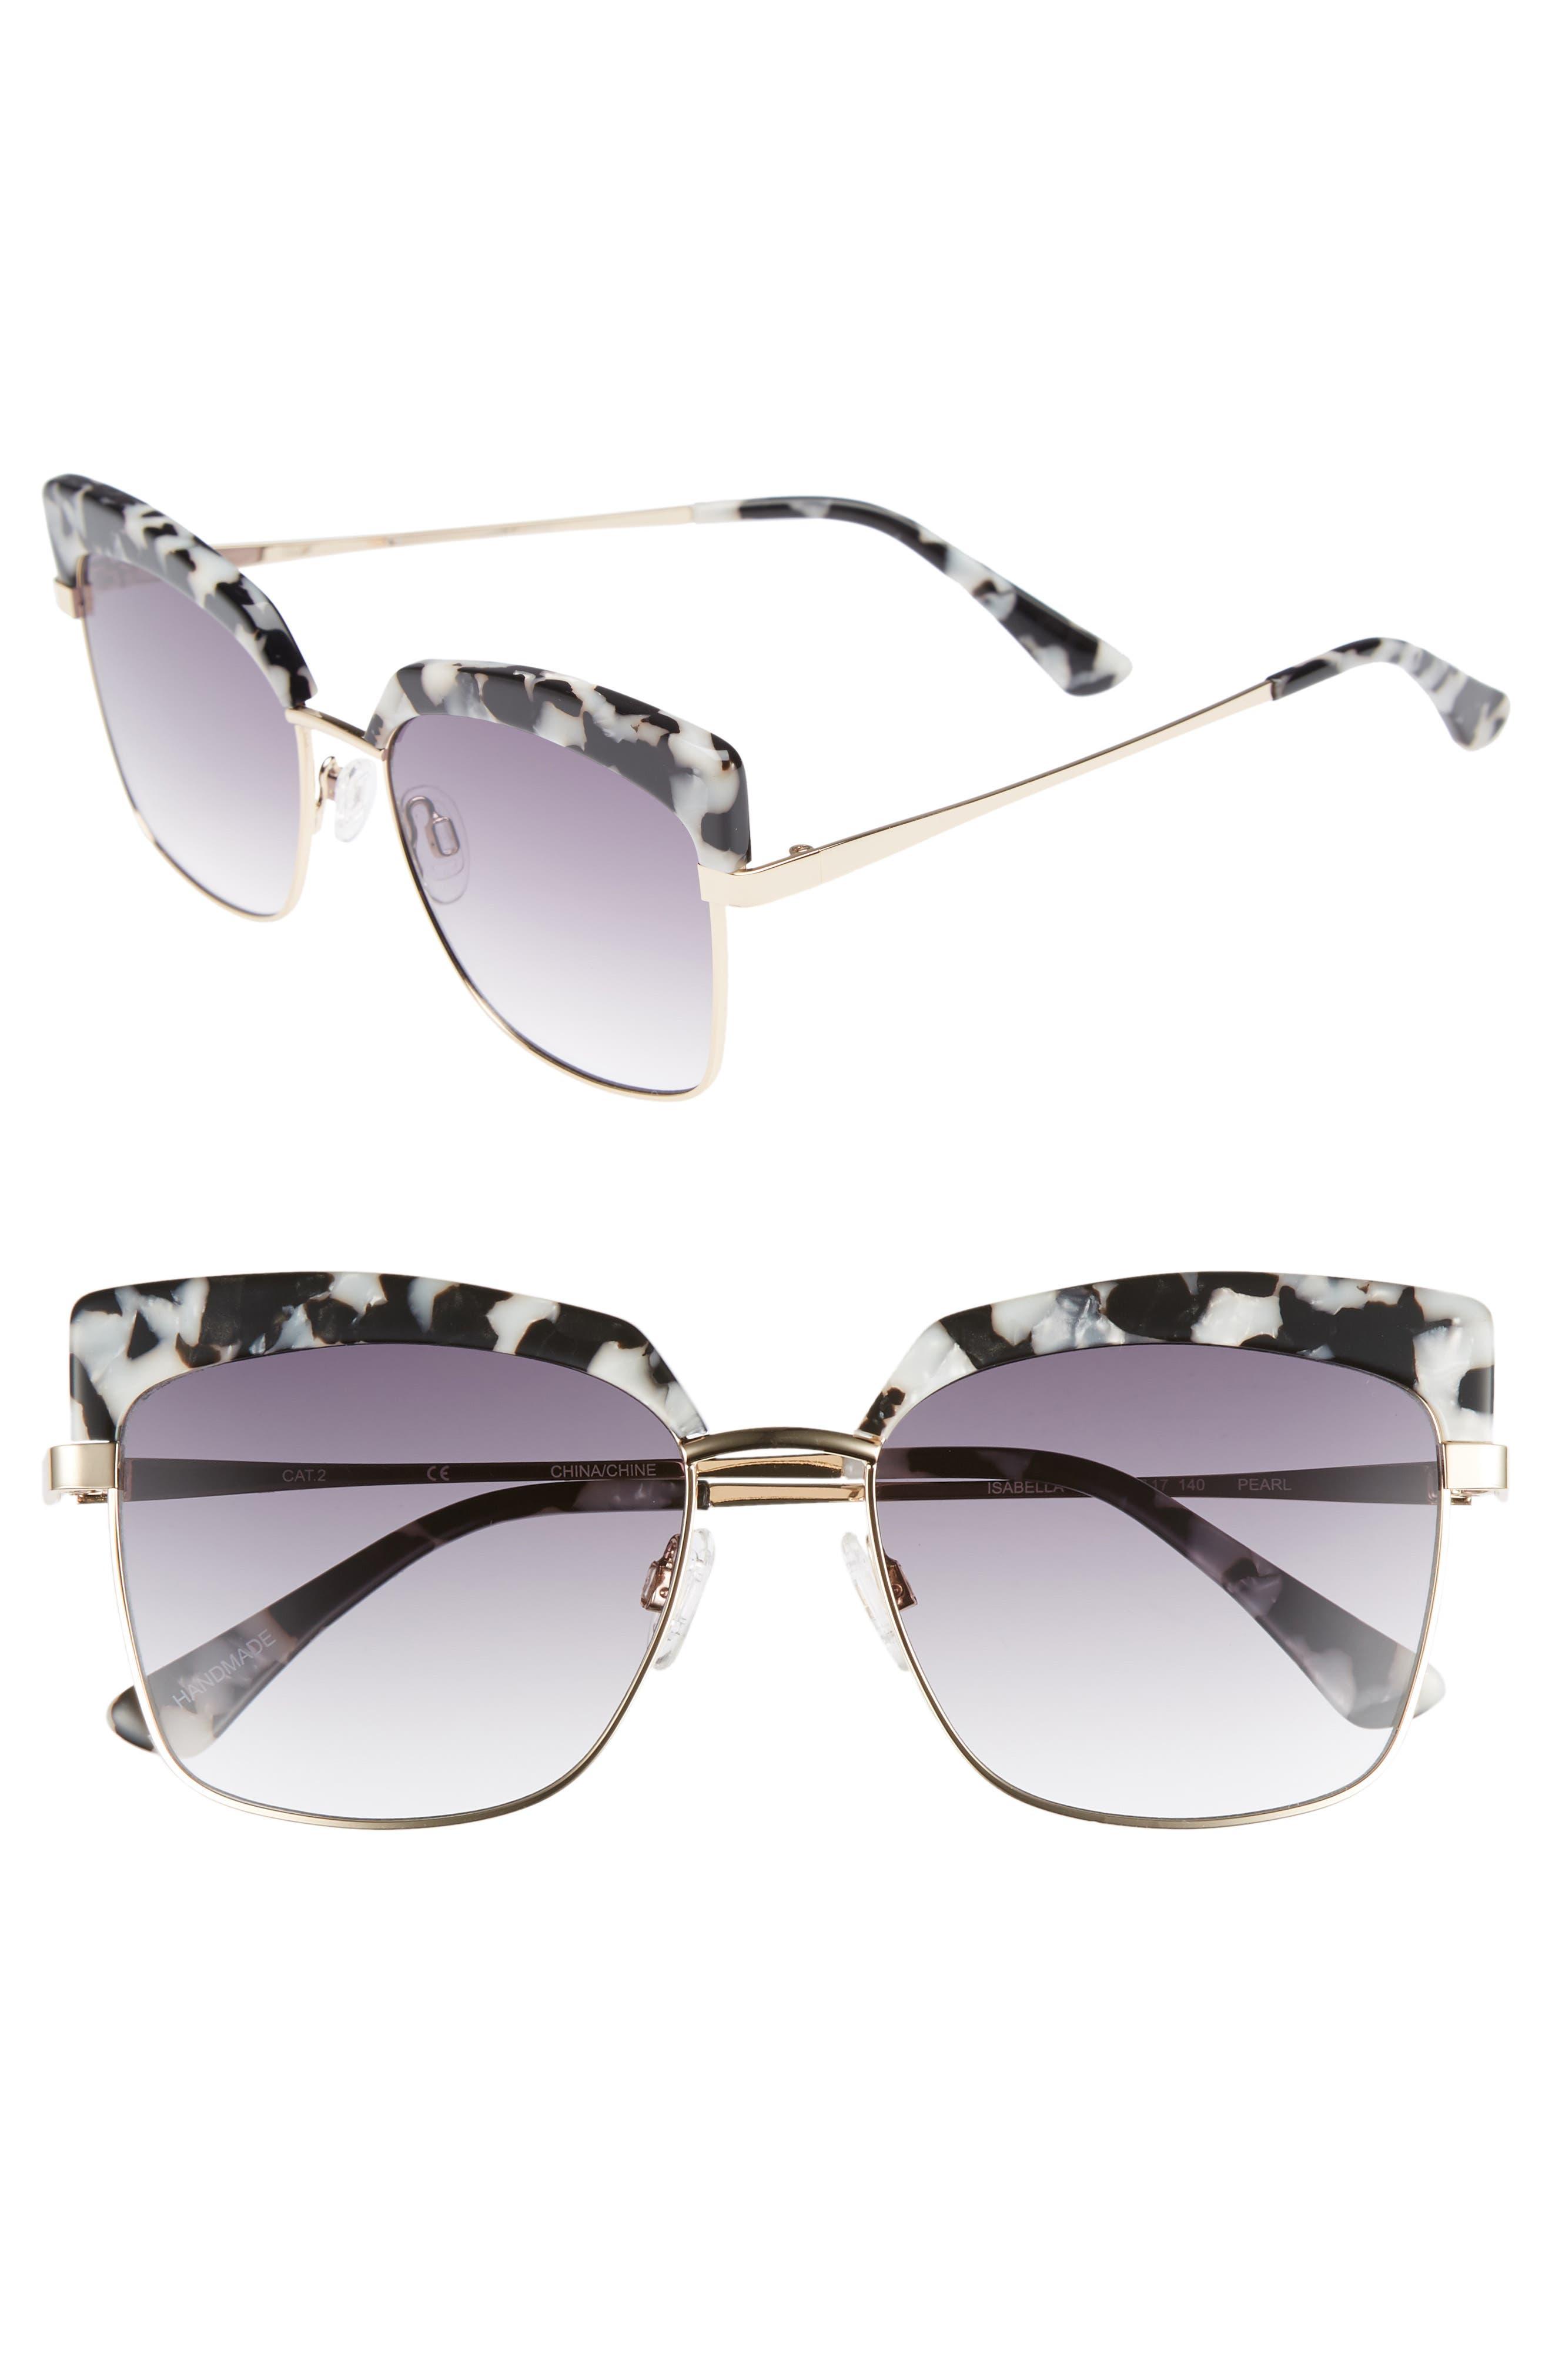 Isabella 56mm Cat Eye Sunglasses,                             Main thumbnail 1, color,                             Black Marble